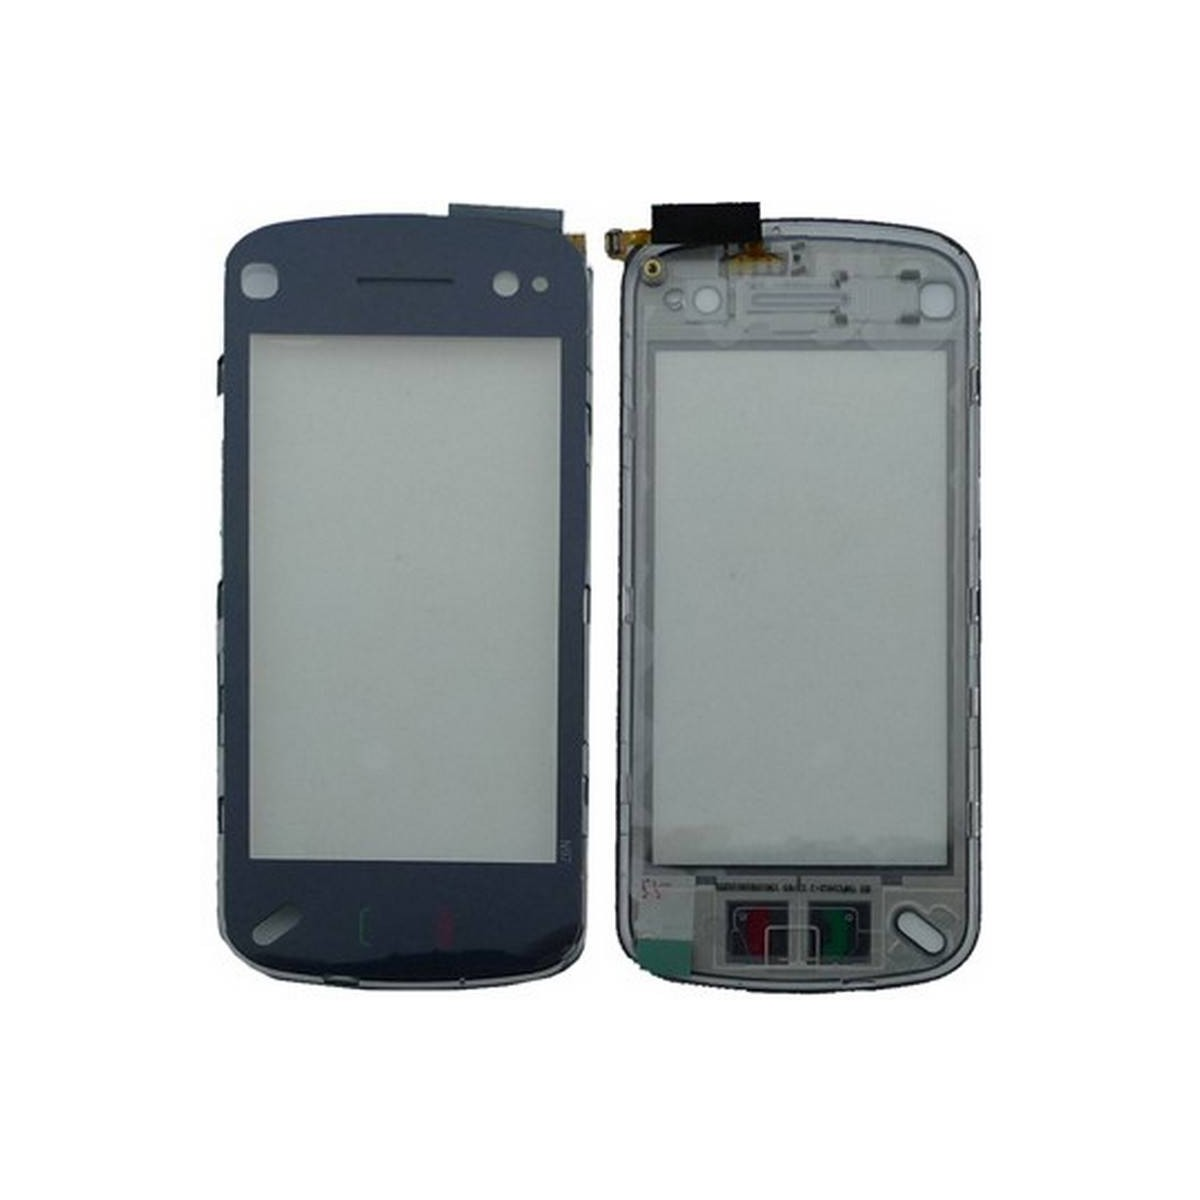 Ecrã táctil (Digitalizador) para Nokia N97